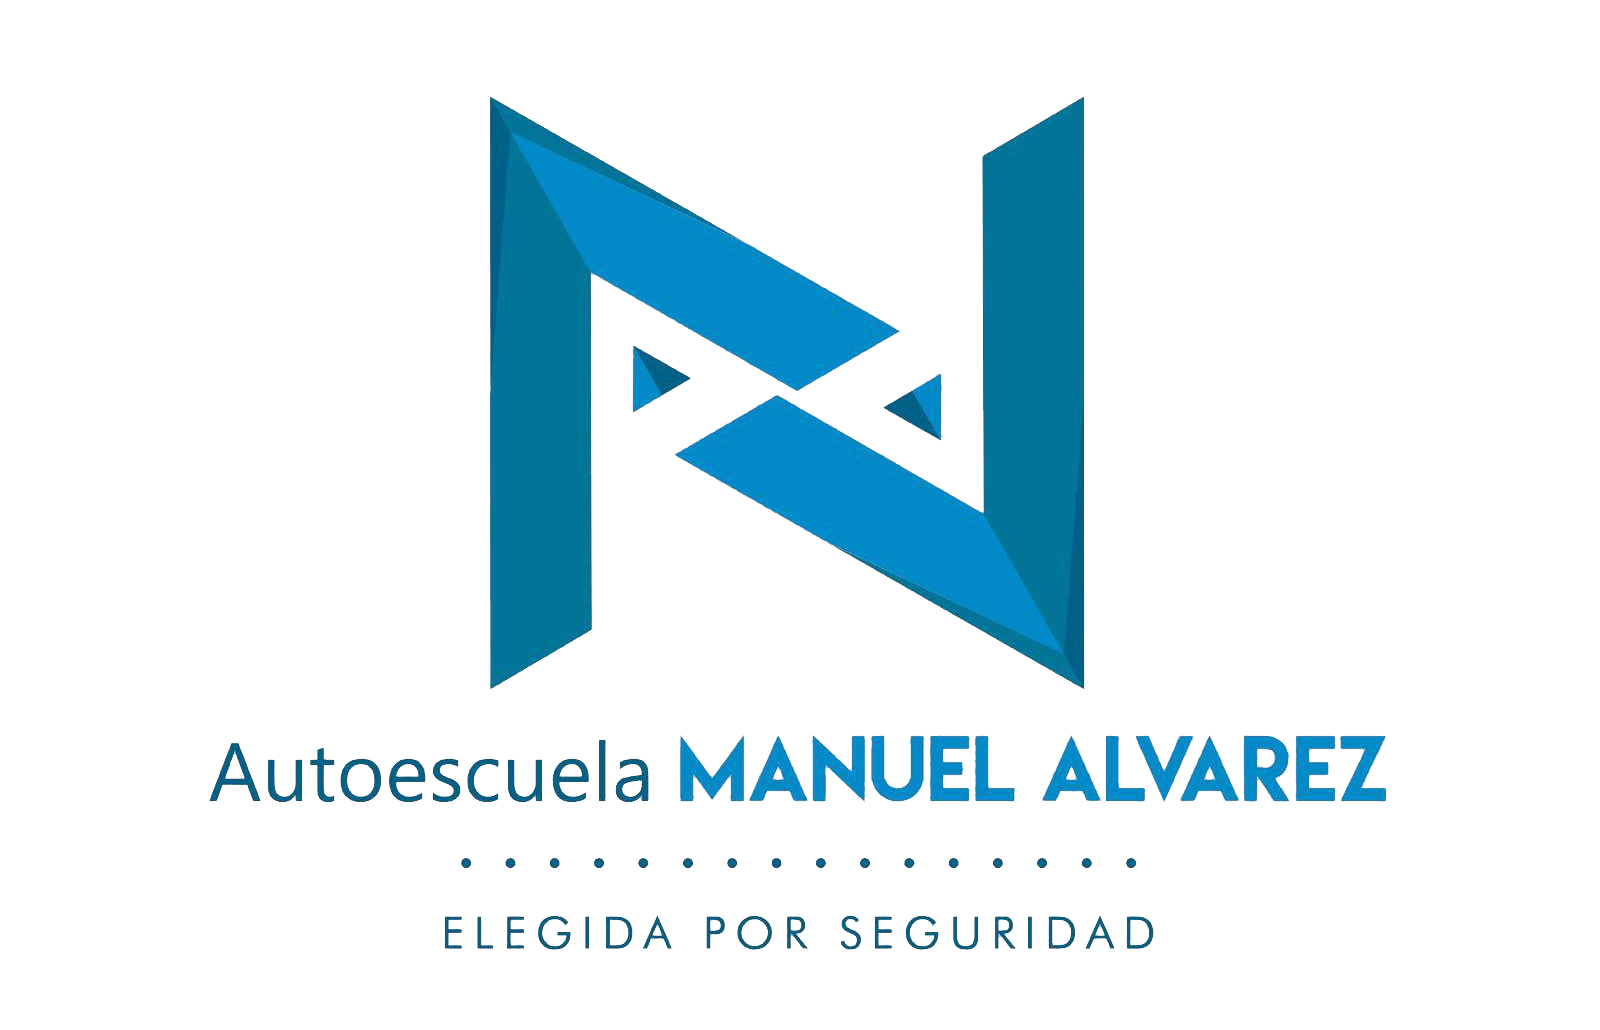 Autoescuela Manuel Alvarez